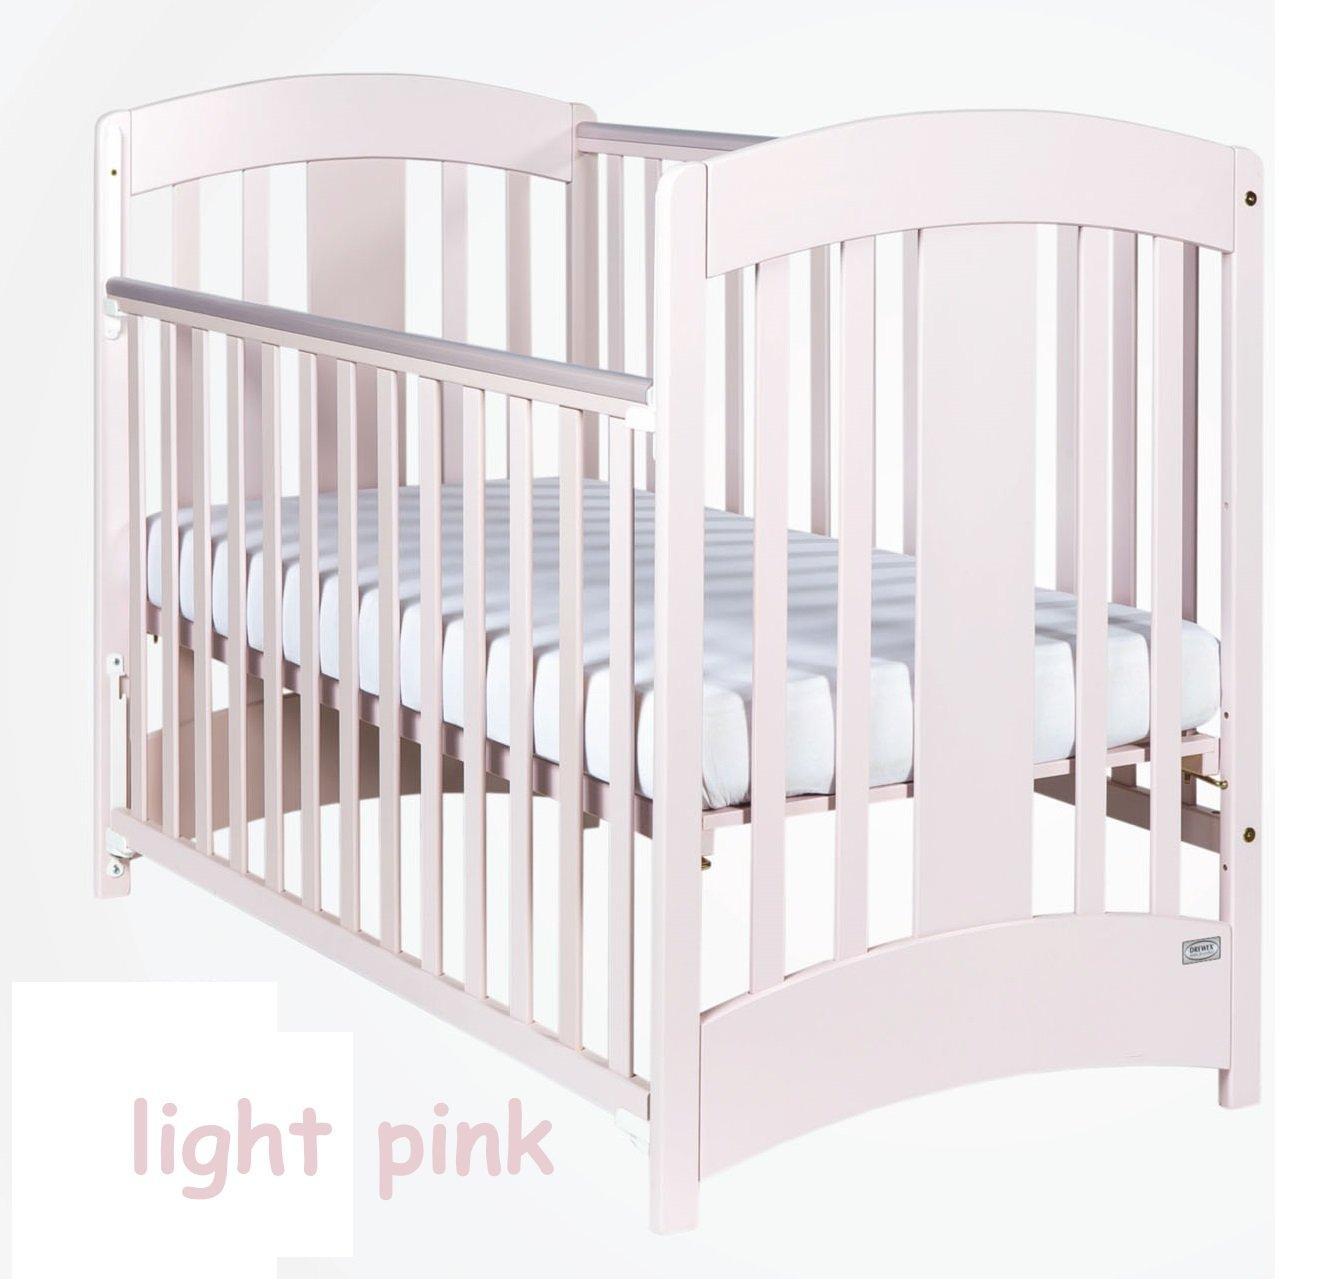 Bērnu gulta ar nolaižamu sānu Drewex NATALIA gaiši rozā